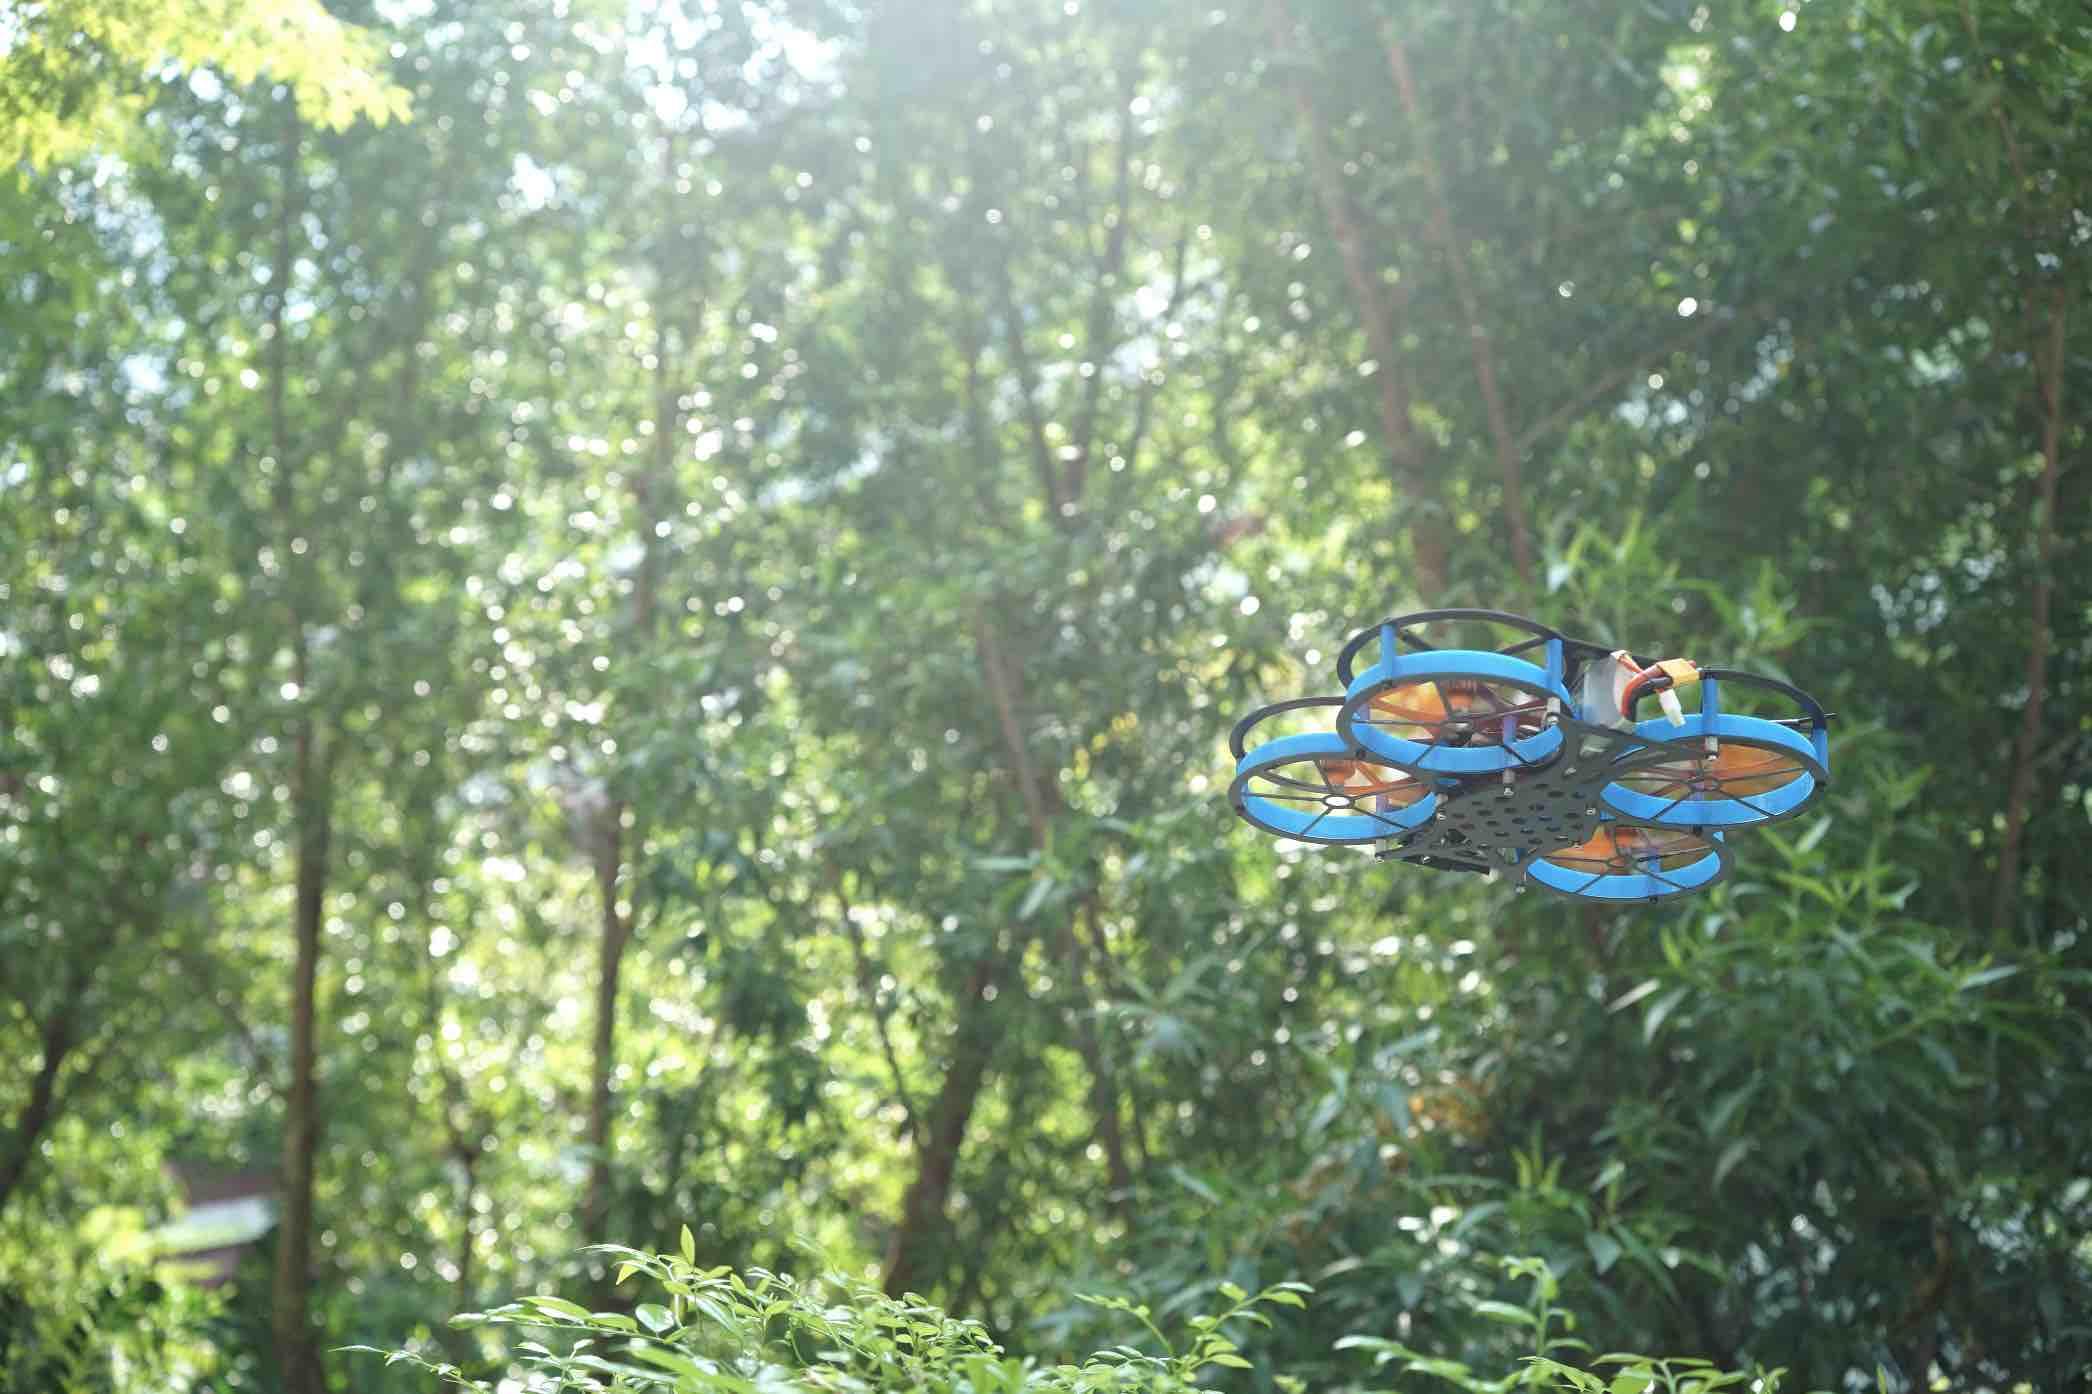 TIM: Tree Inspection Microdrone